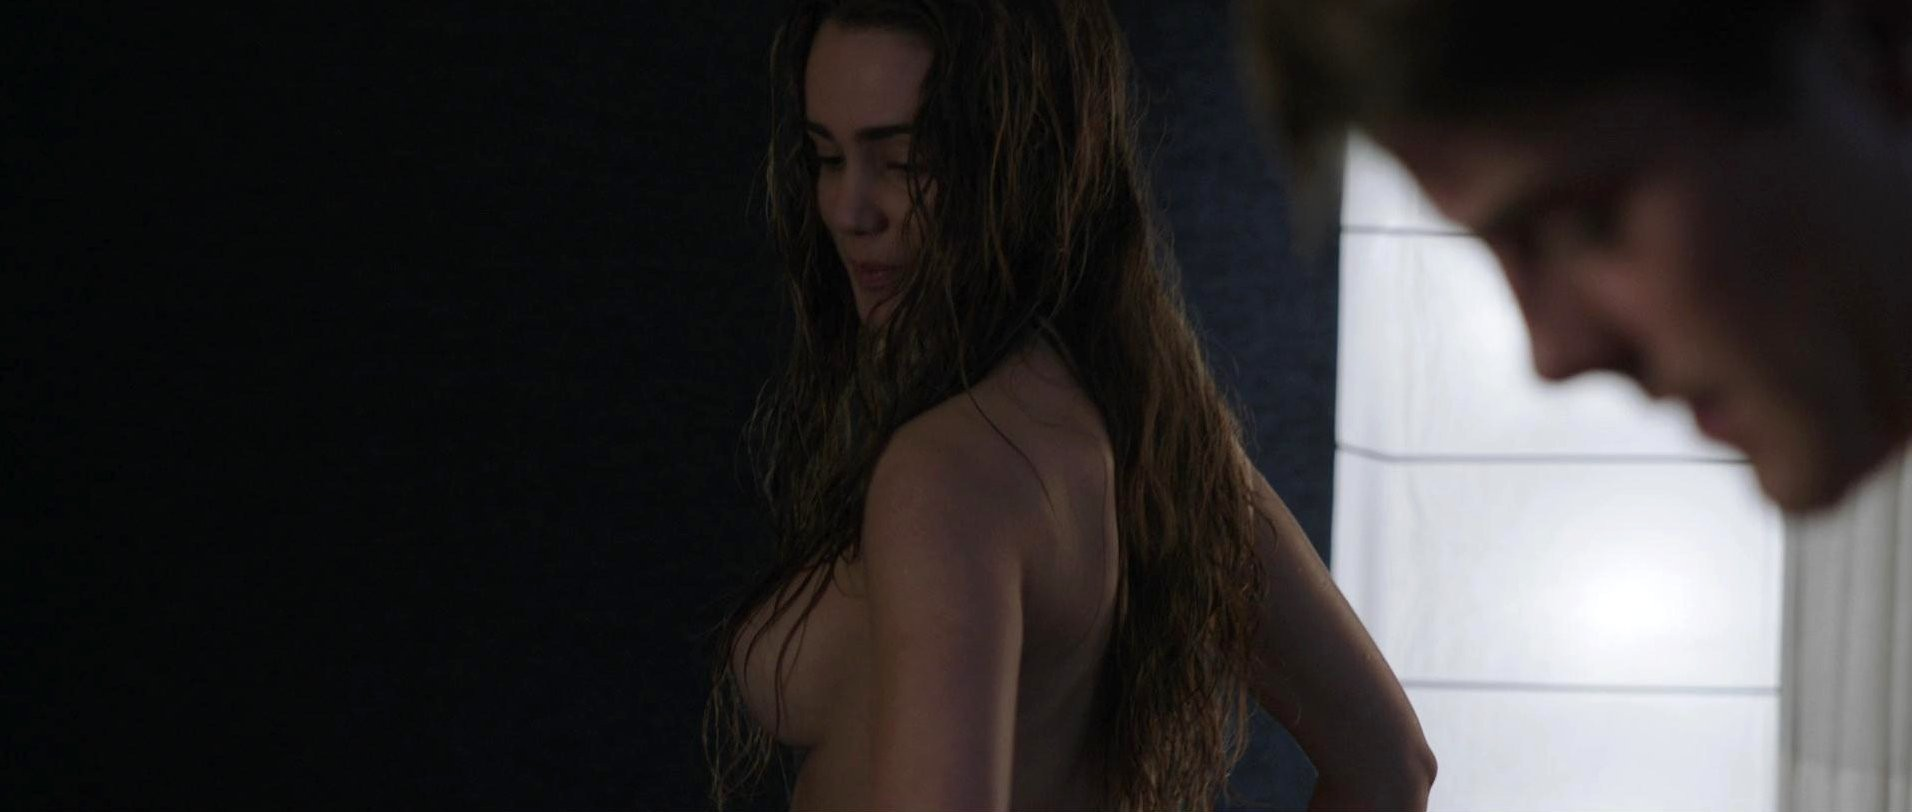 Alicia Sanz fotos filtradas desnuda